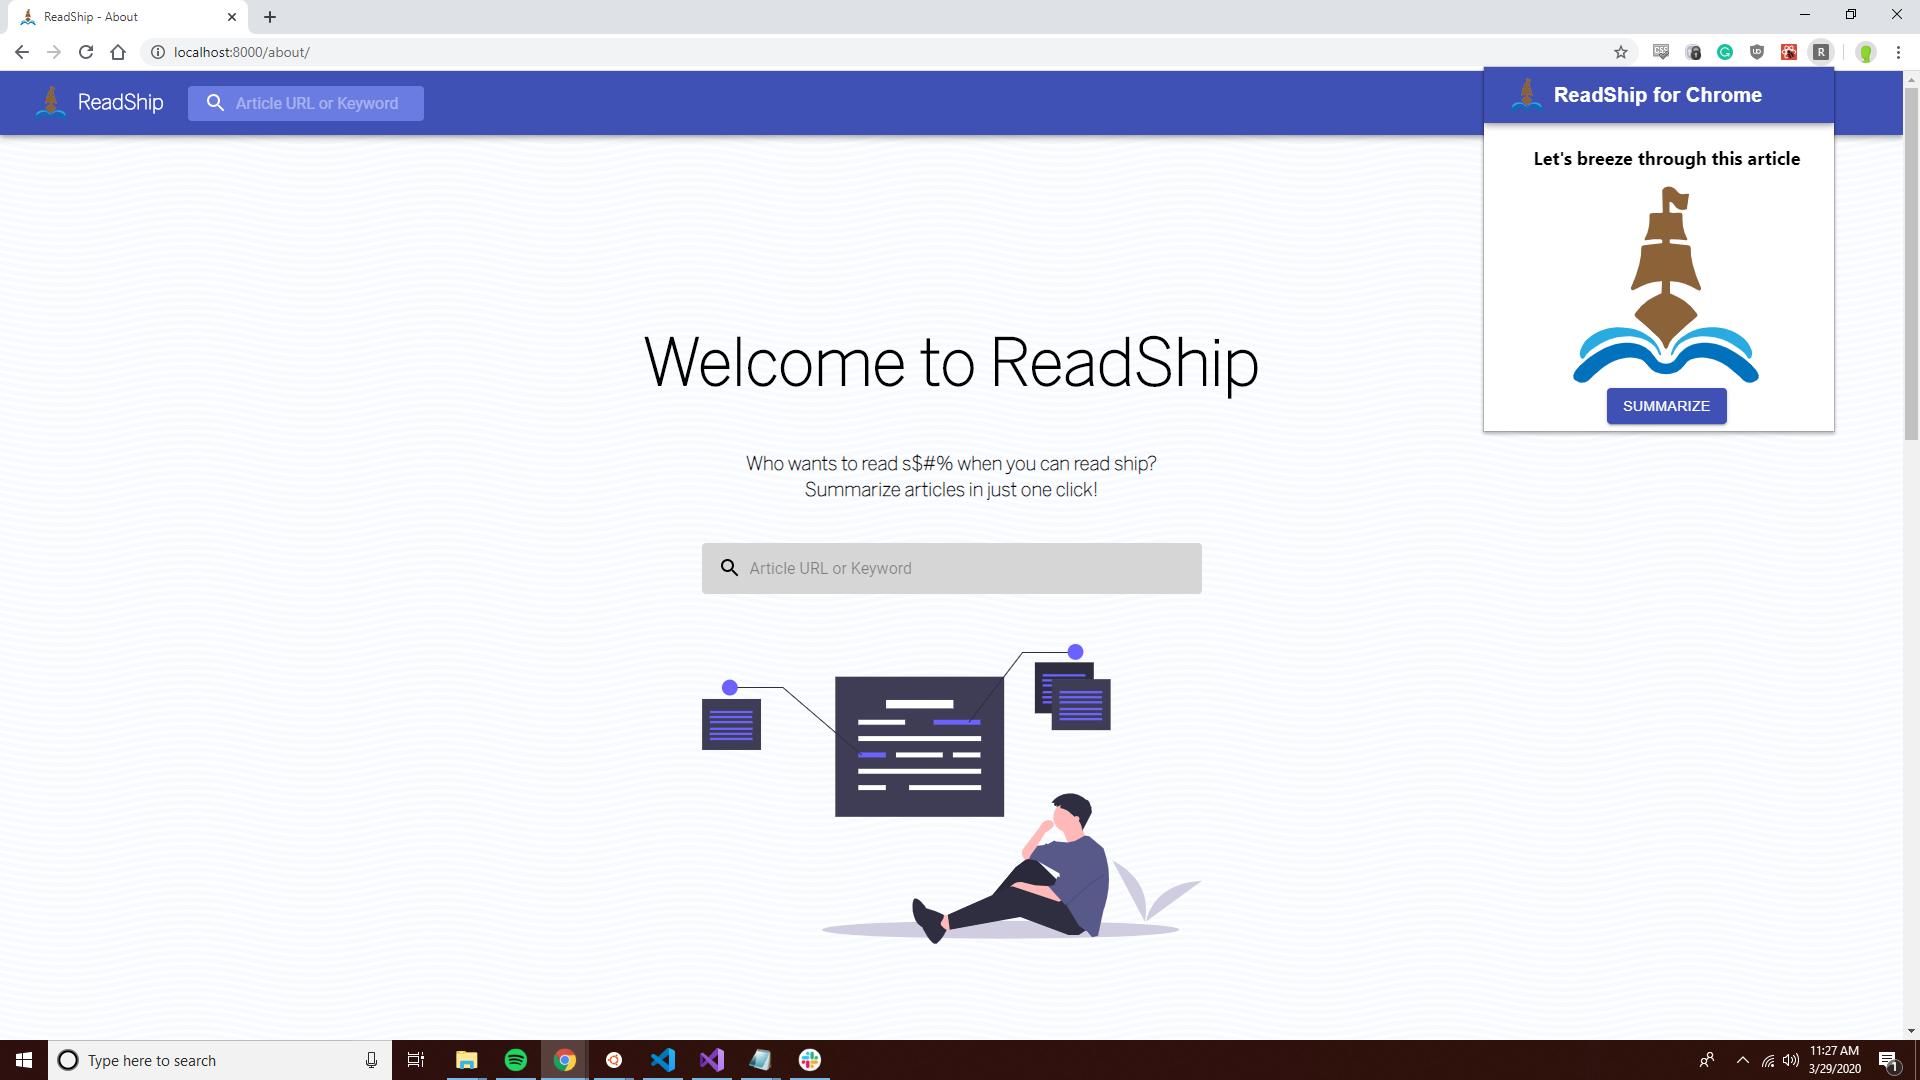 ReadShip